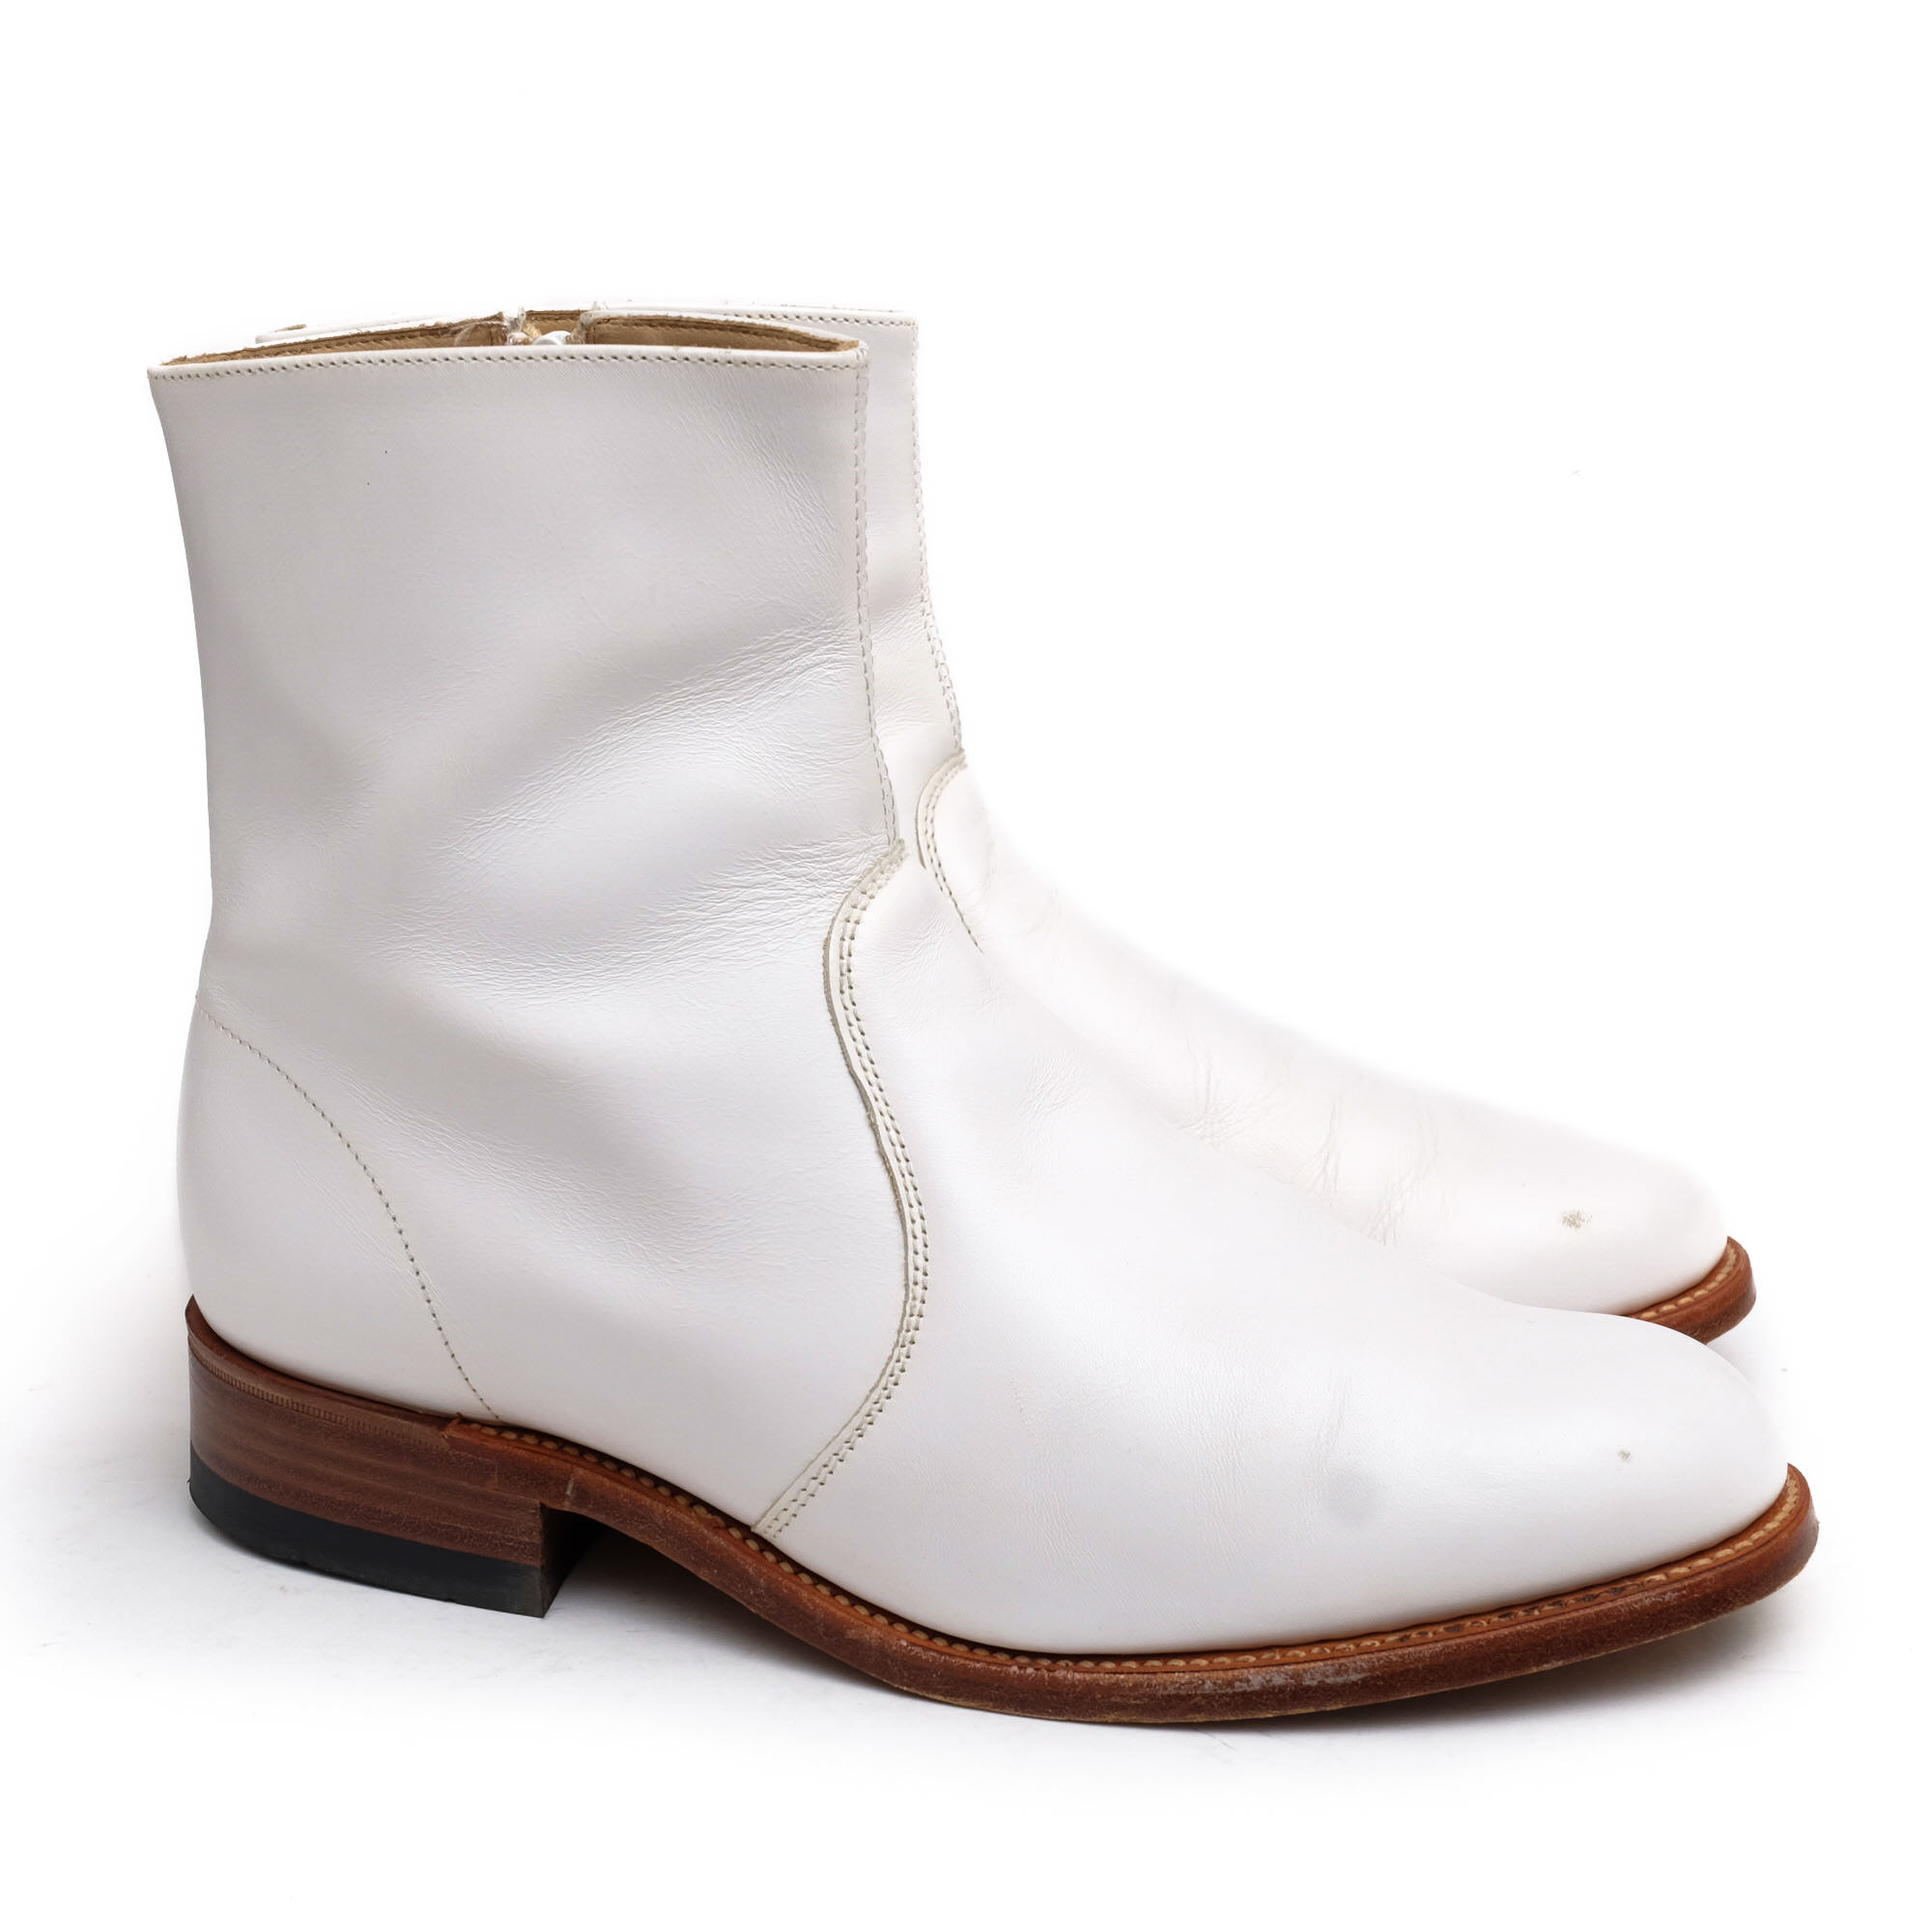 b8a72ba912526a サンダース / SANDERS サイドジップブーツ レディース ホワイト 白 ...